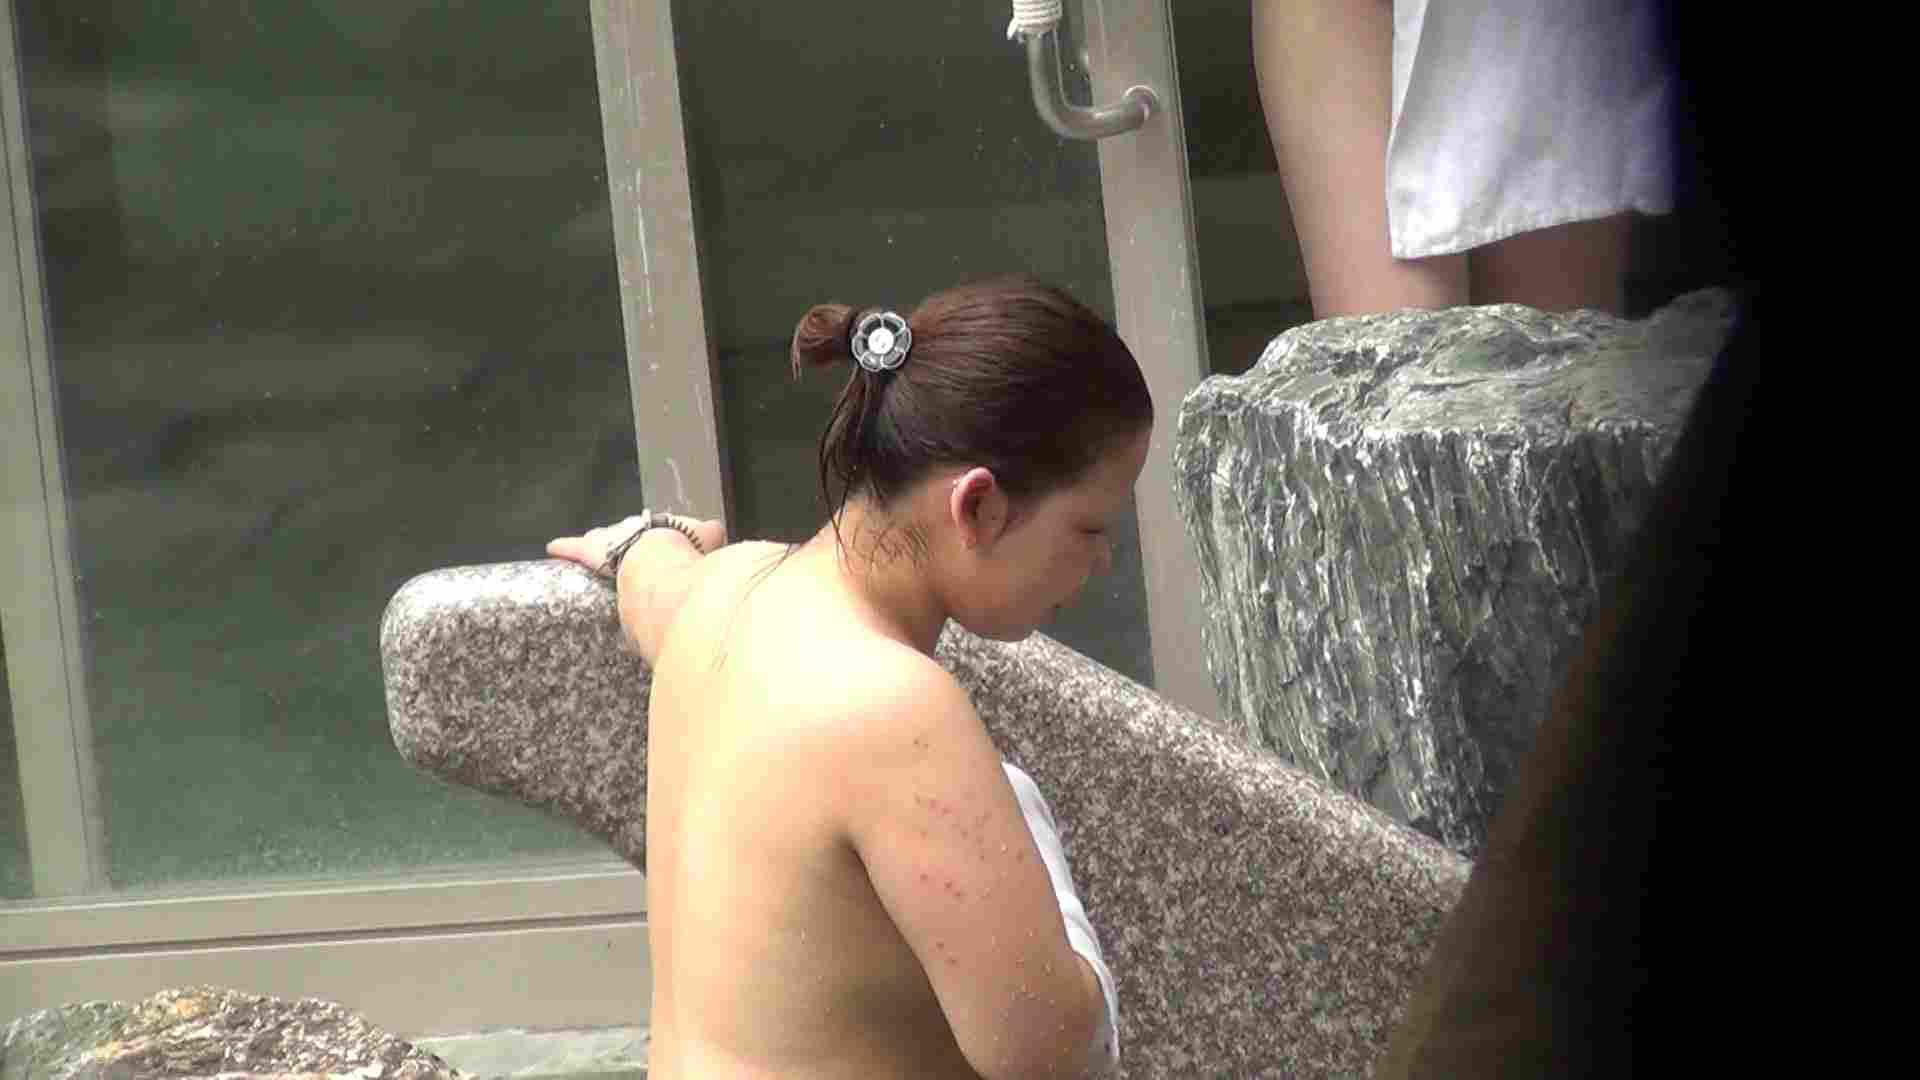 Aquaな露天風呂Vol.312 露天 おまんこ無修正動画無料 71連発 69